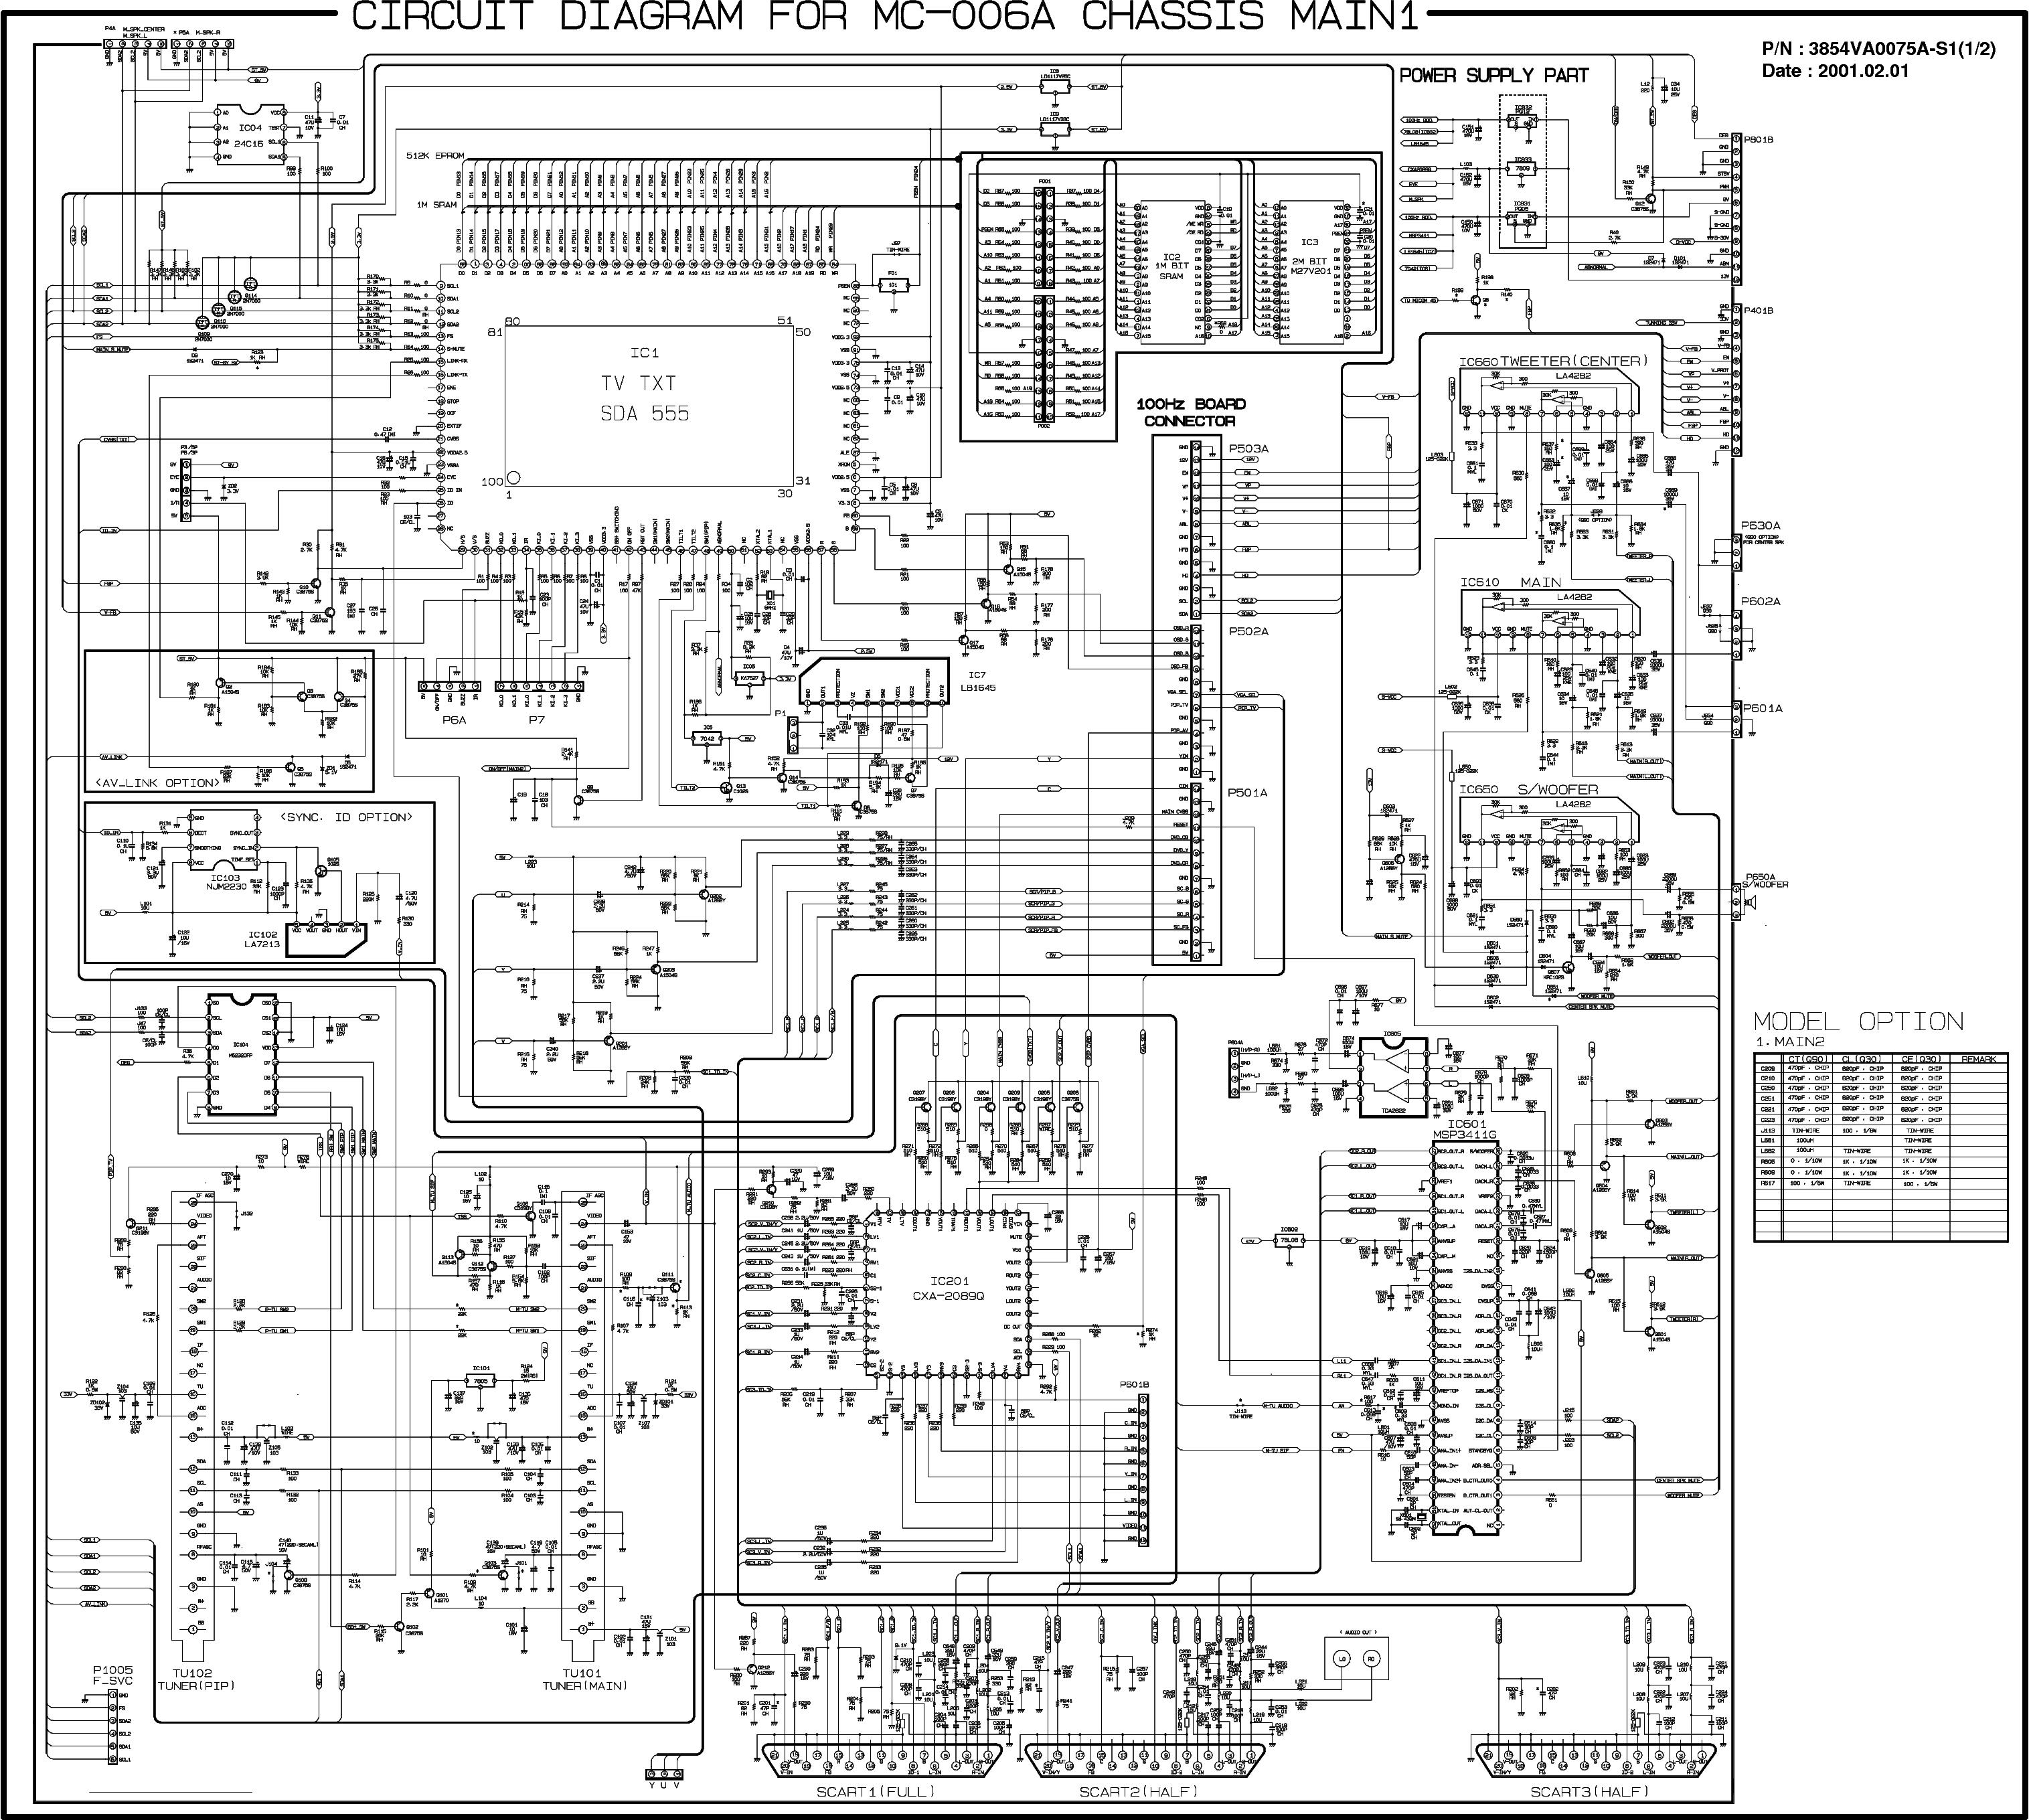 lg cw62b chassis 21fb5rlx sm service manual free download